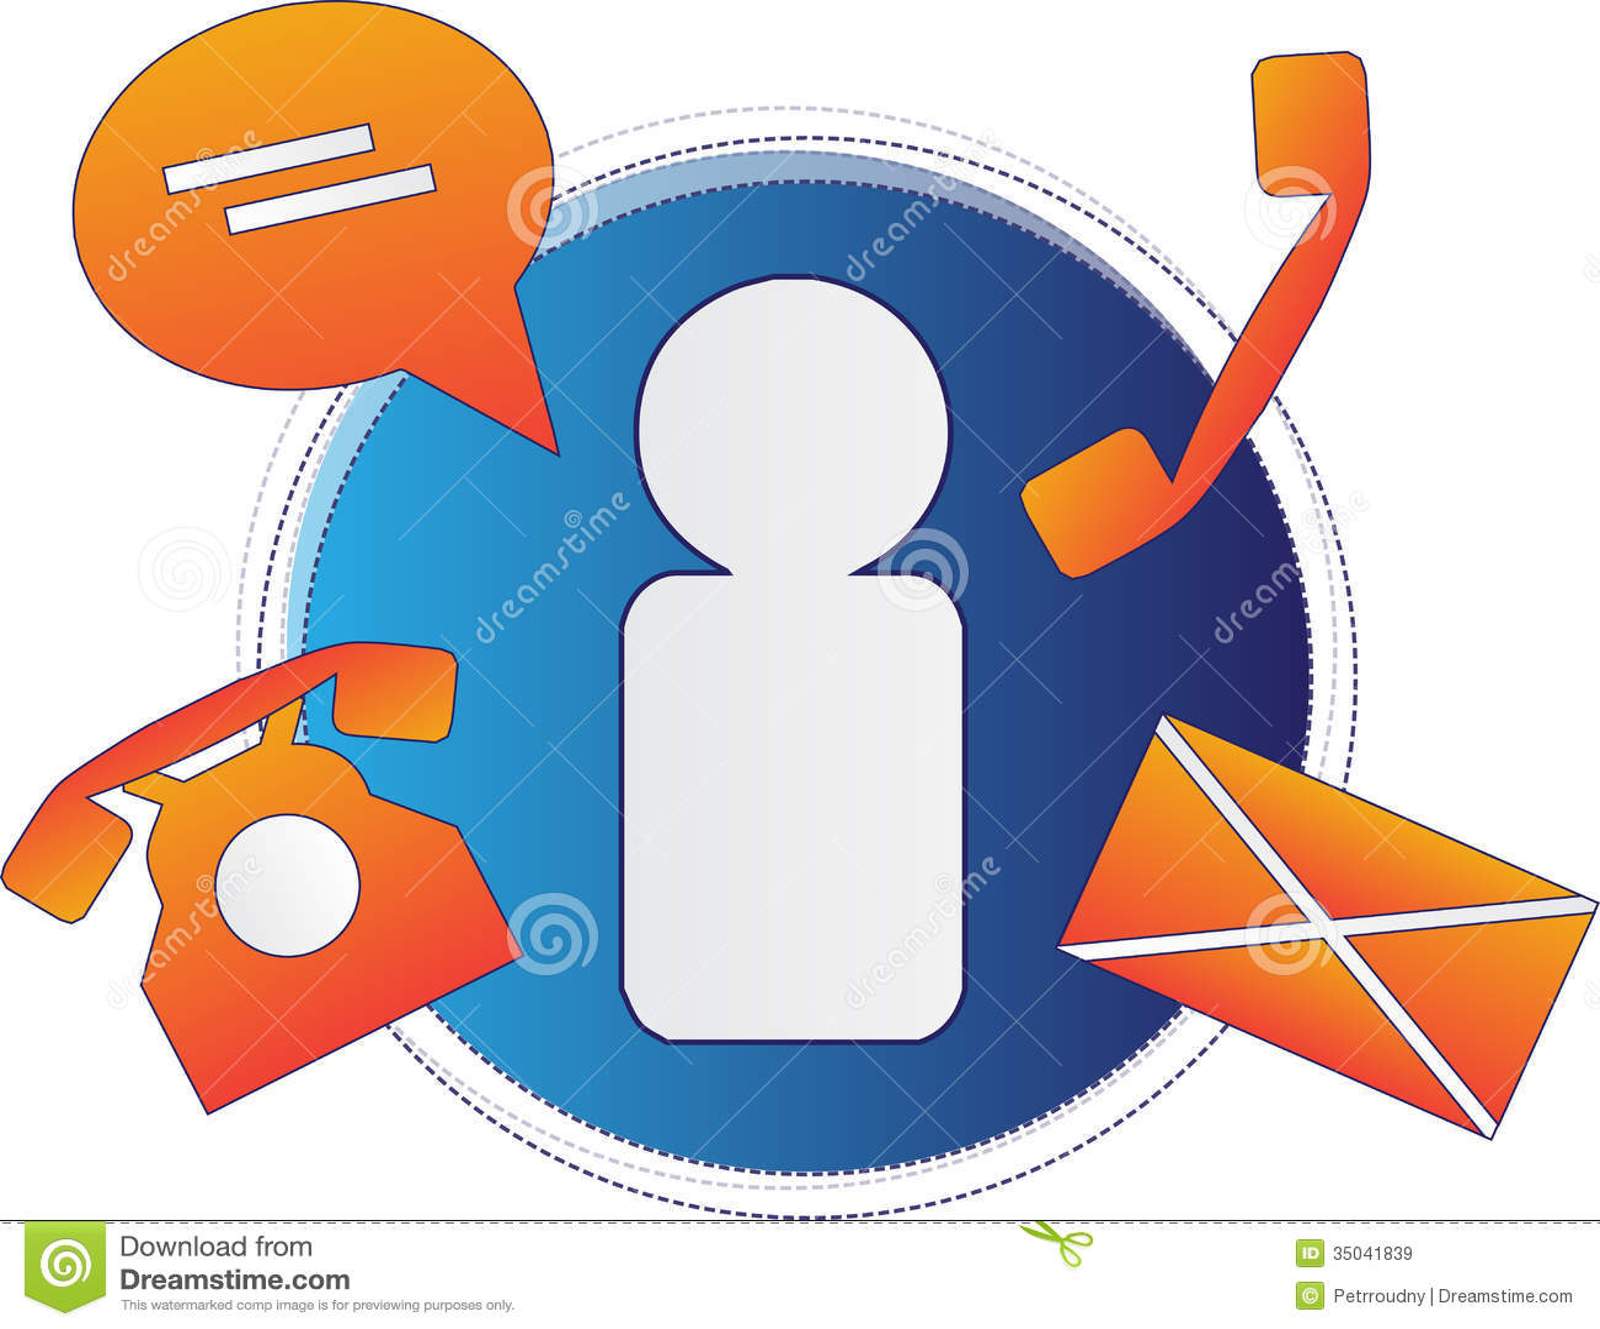 Business Communication Royalty Free Stock Images - Image ...